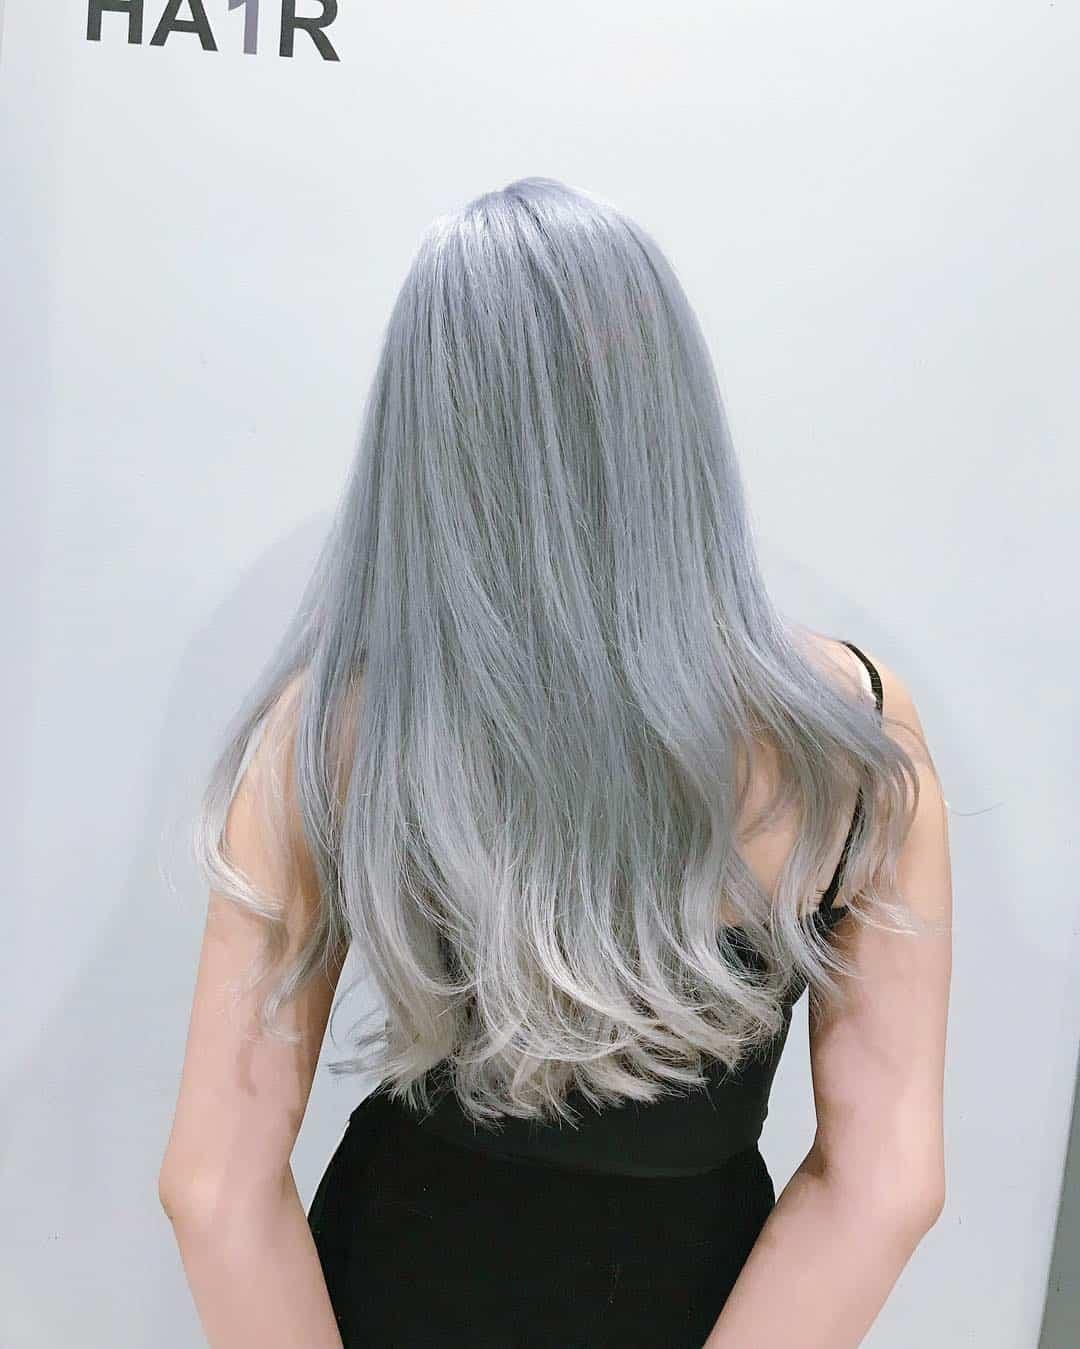 Tóc nhuộm màu xám khói ombre